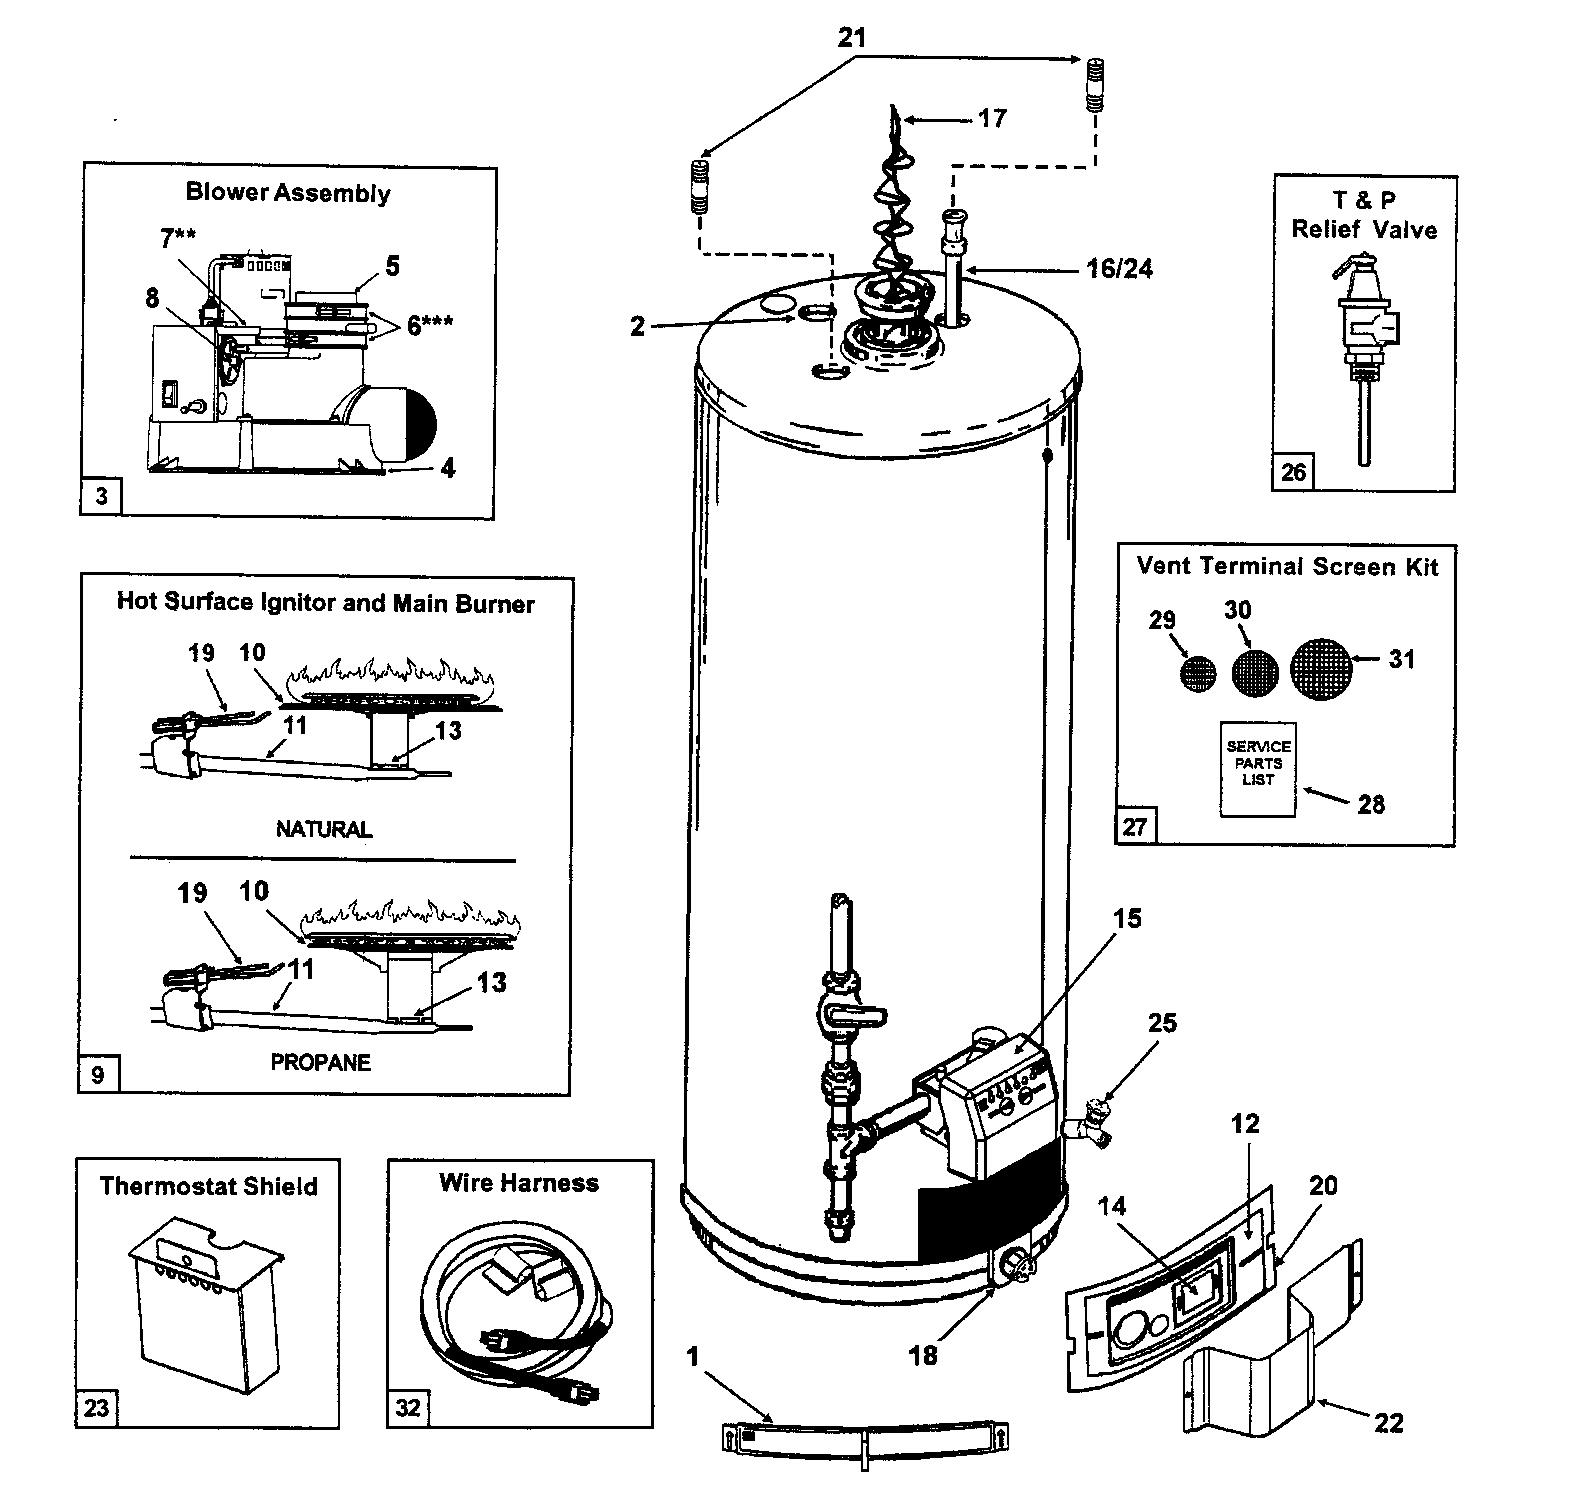 hight resolution of 1979 camaro engine diagram